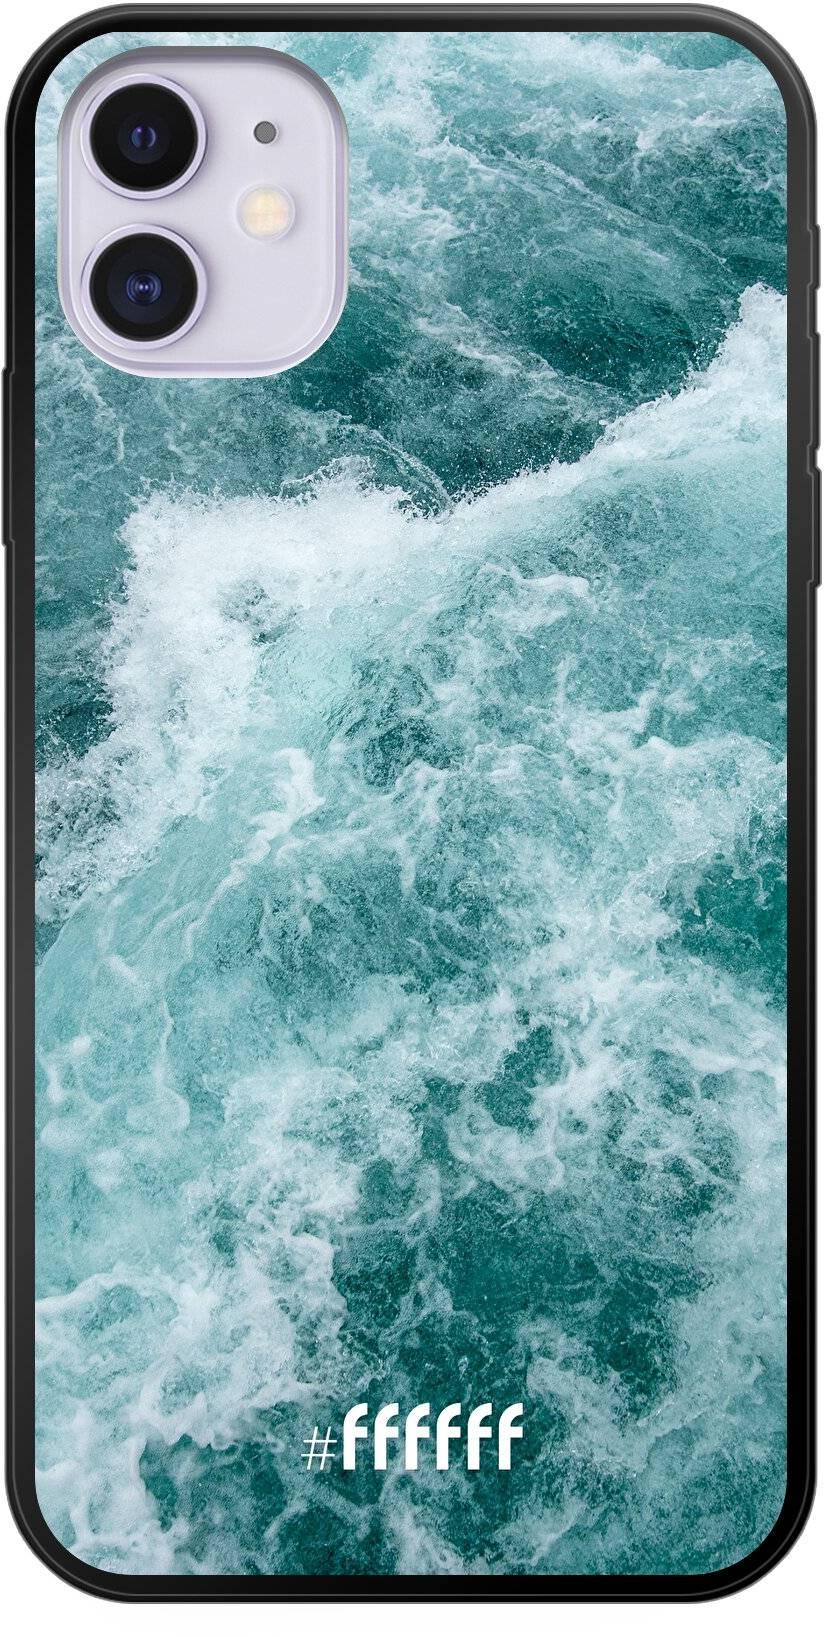 Whitecap Waves iPhone 11